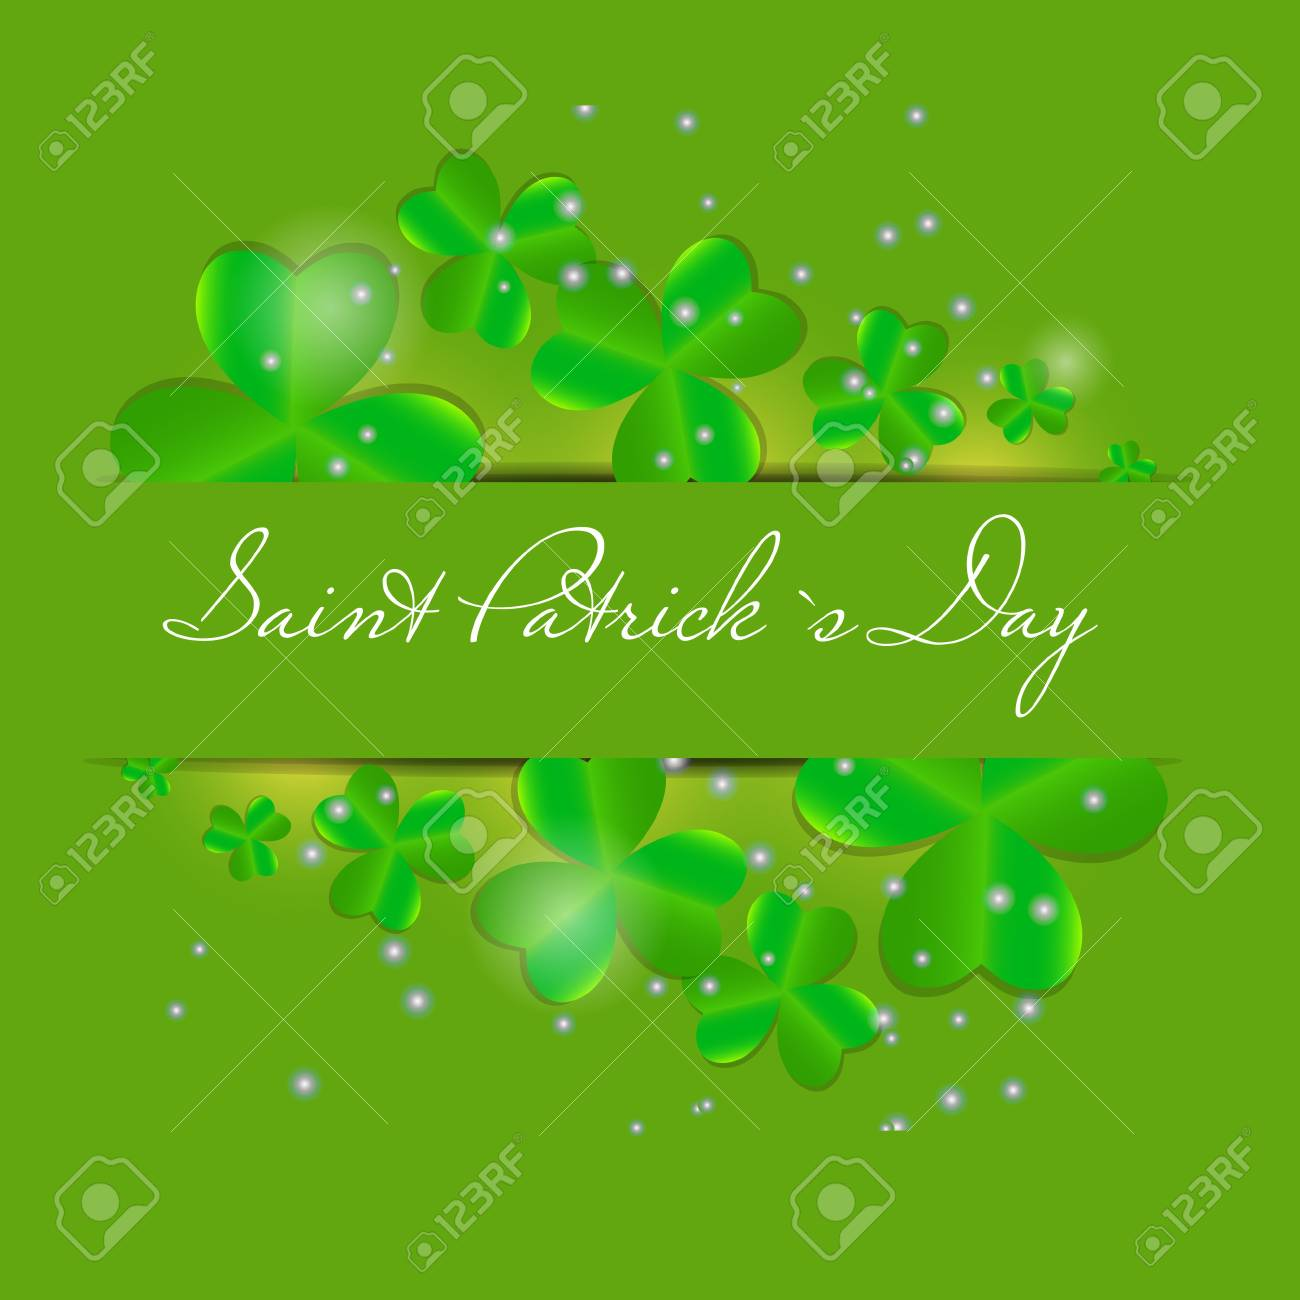 Saint Patrick s day background vector illustration Stock Vector - 17248793